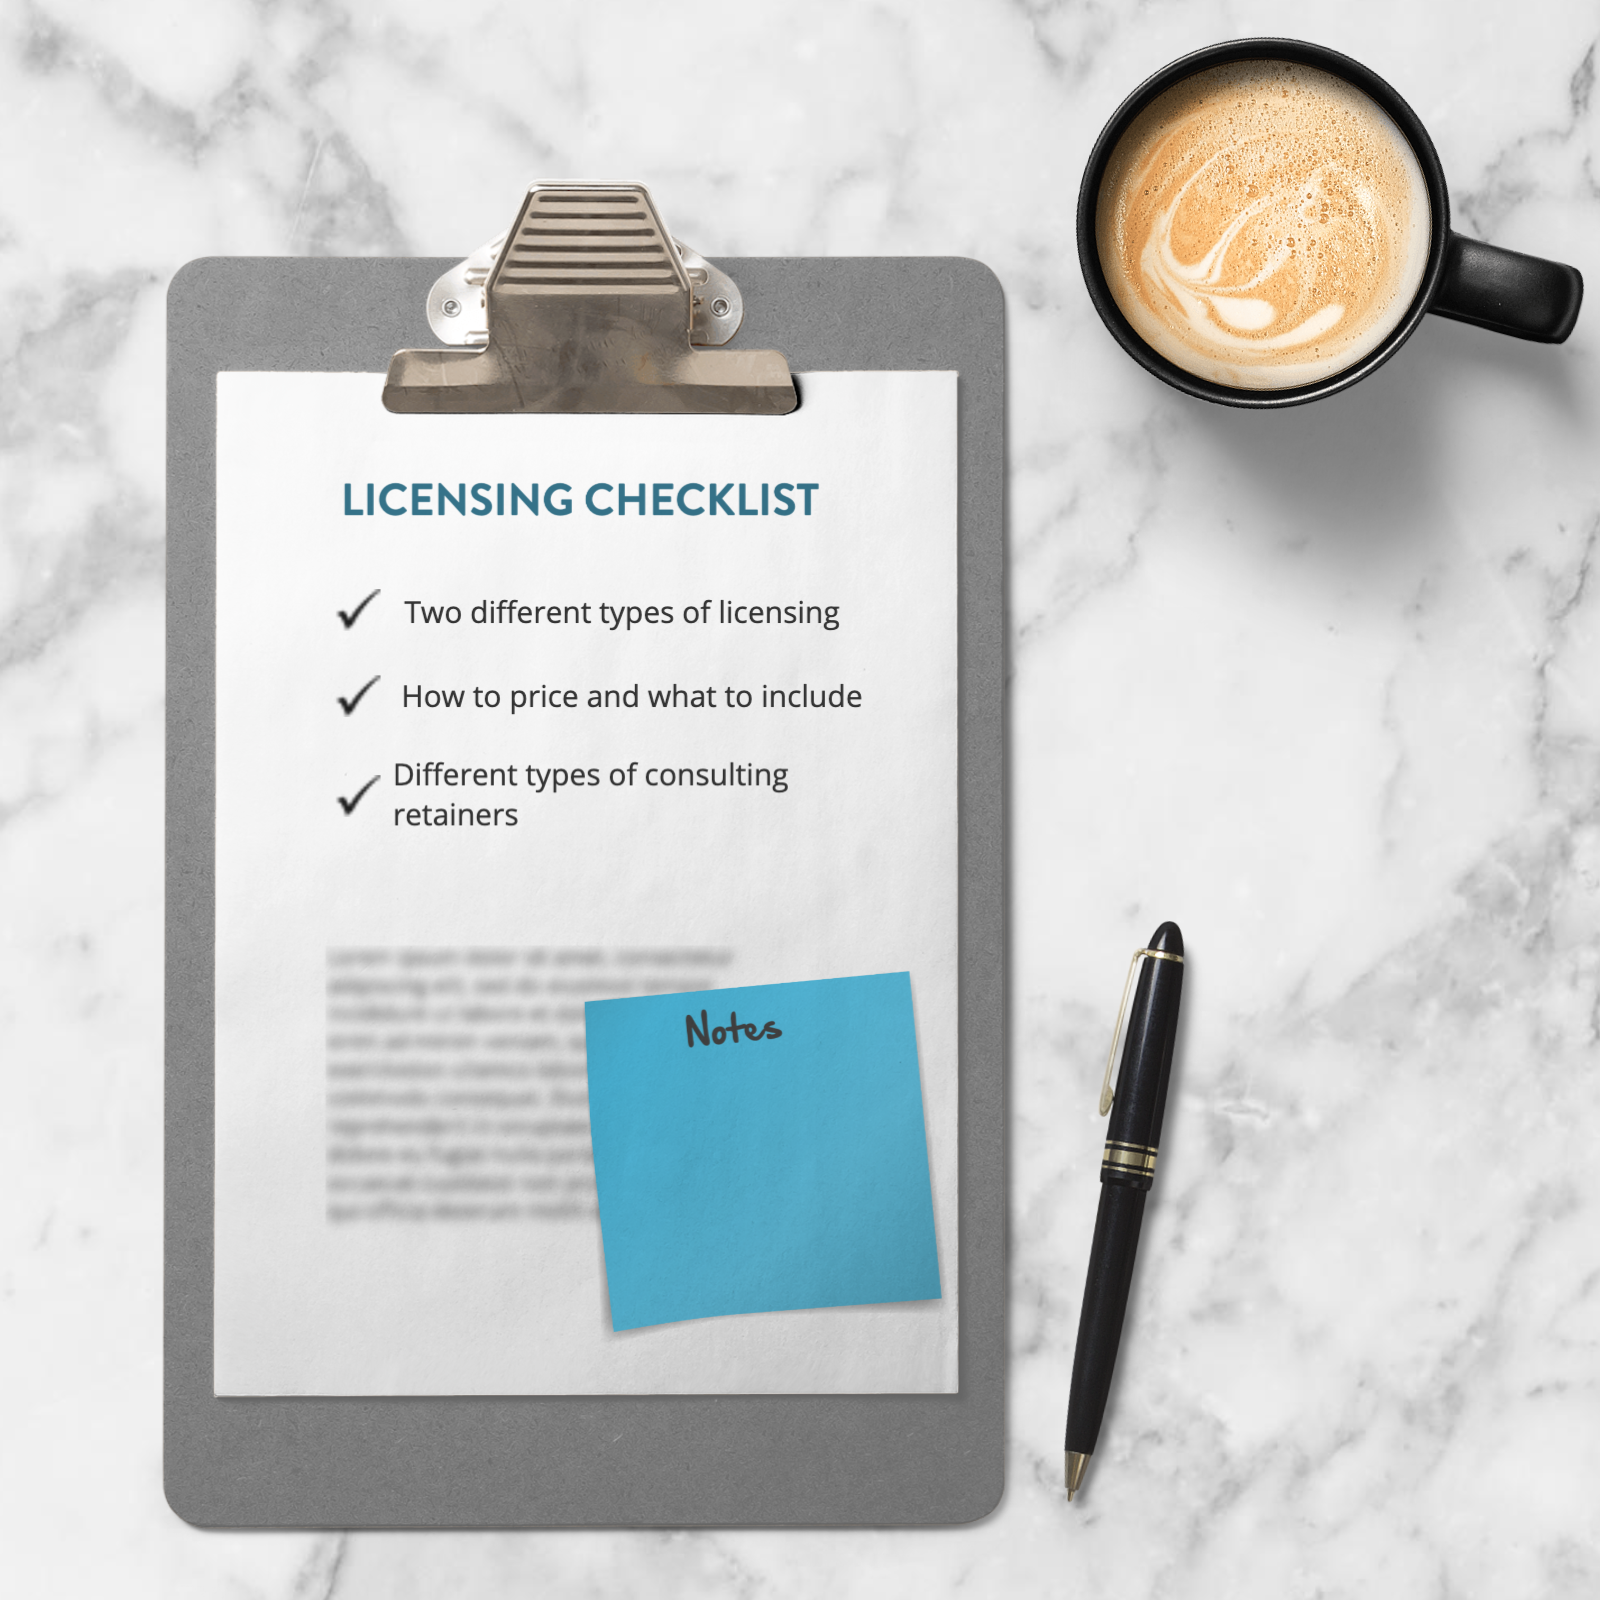 Licensing Checklist